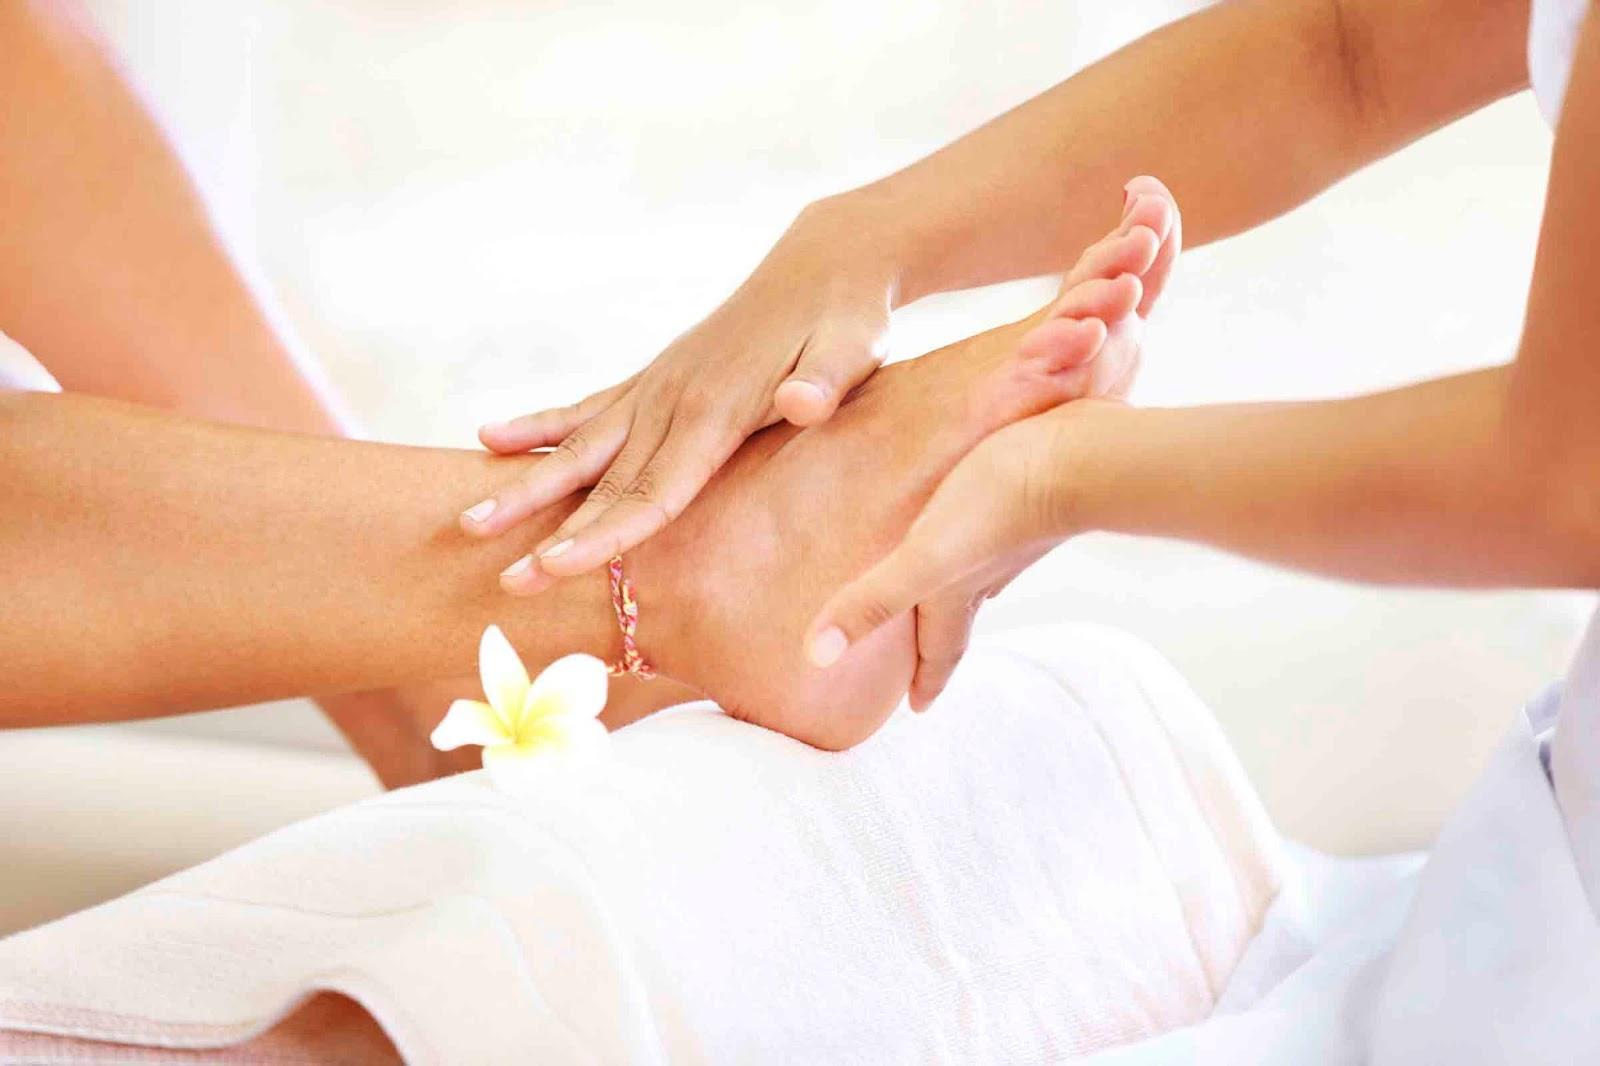 jenis macam layanans servis treatment perawatan kuku cantik indah penampilan cewek desain nail art kapster salon beauty therapist pijat massage cakep manicure pedicure spa kecantikan